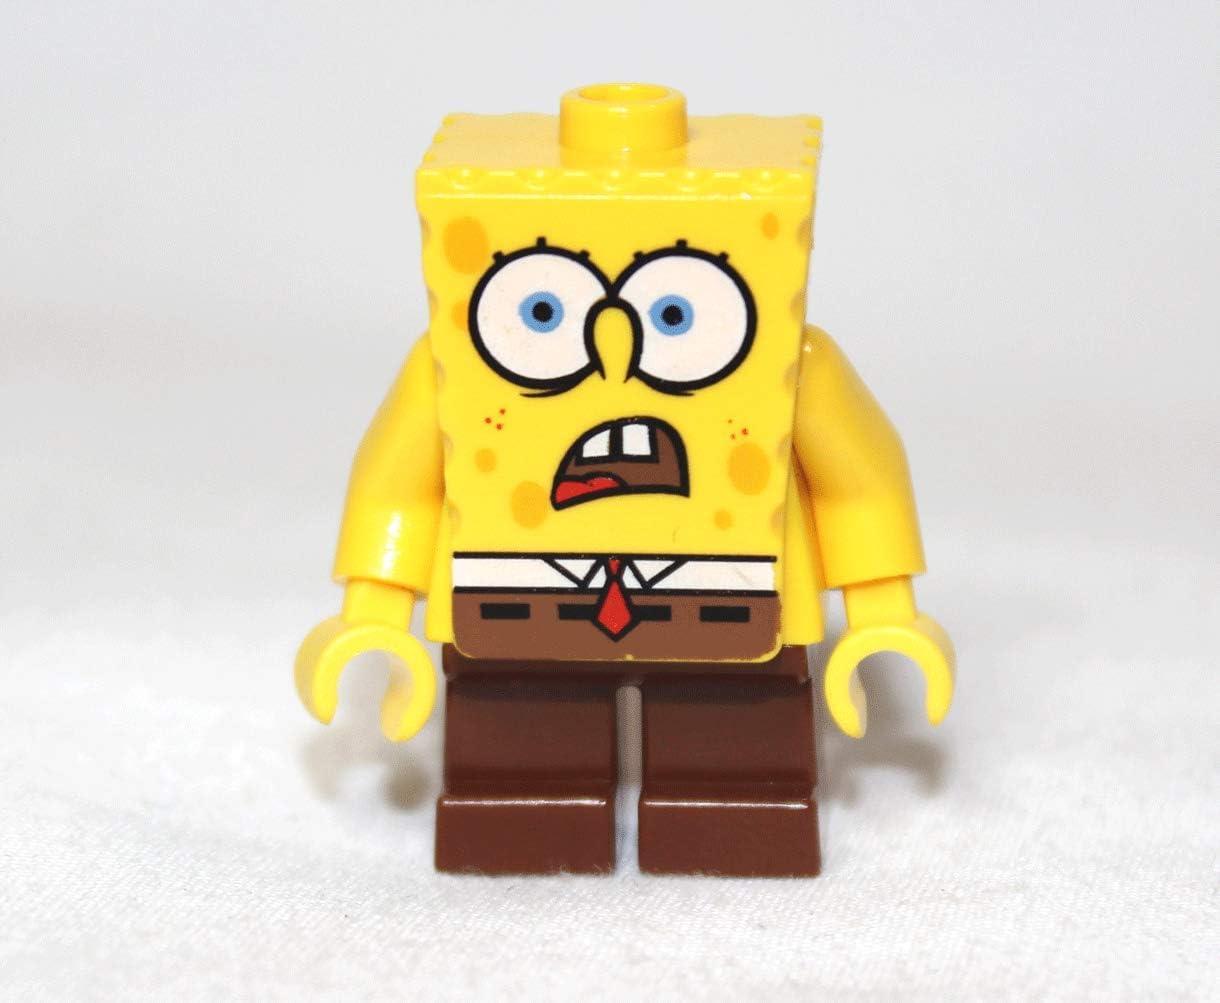 "Spongebob Squarepants (Shocked) - LEGO Spongebob 2"" Figure"